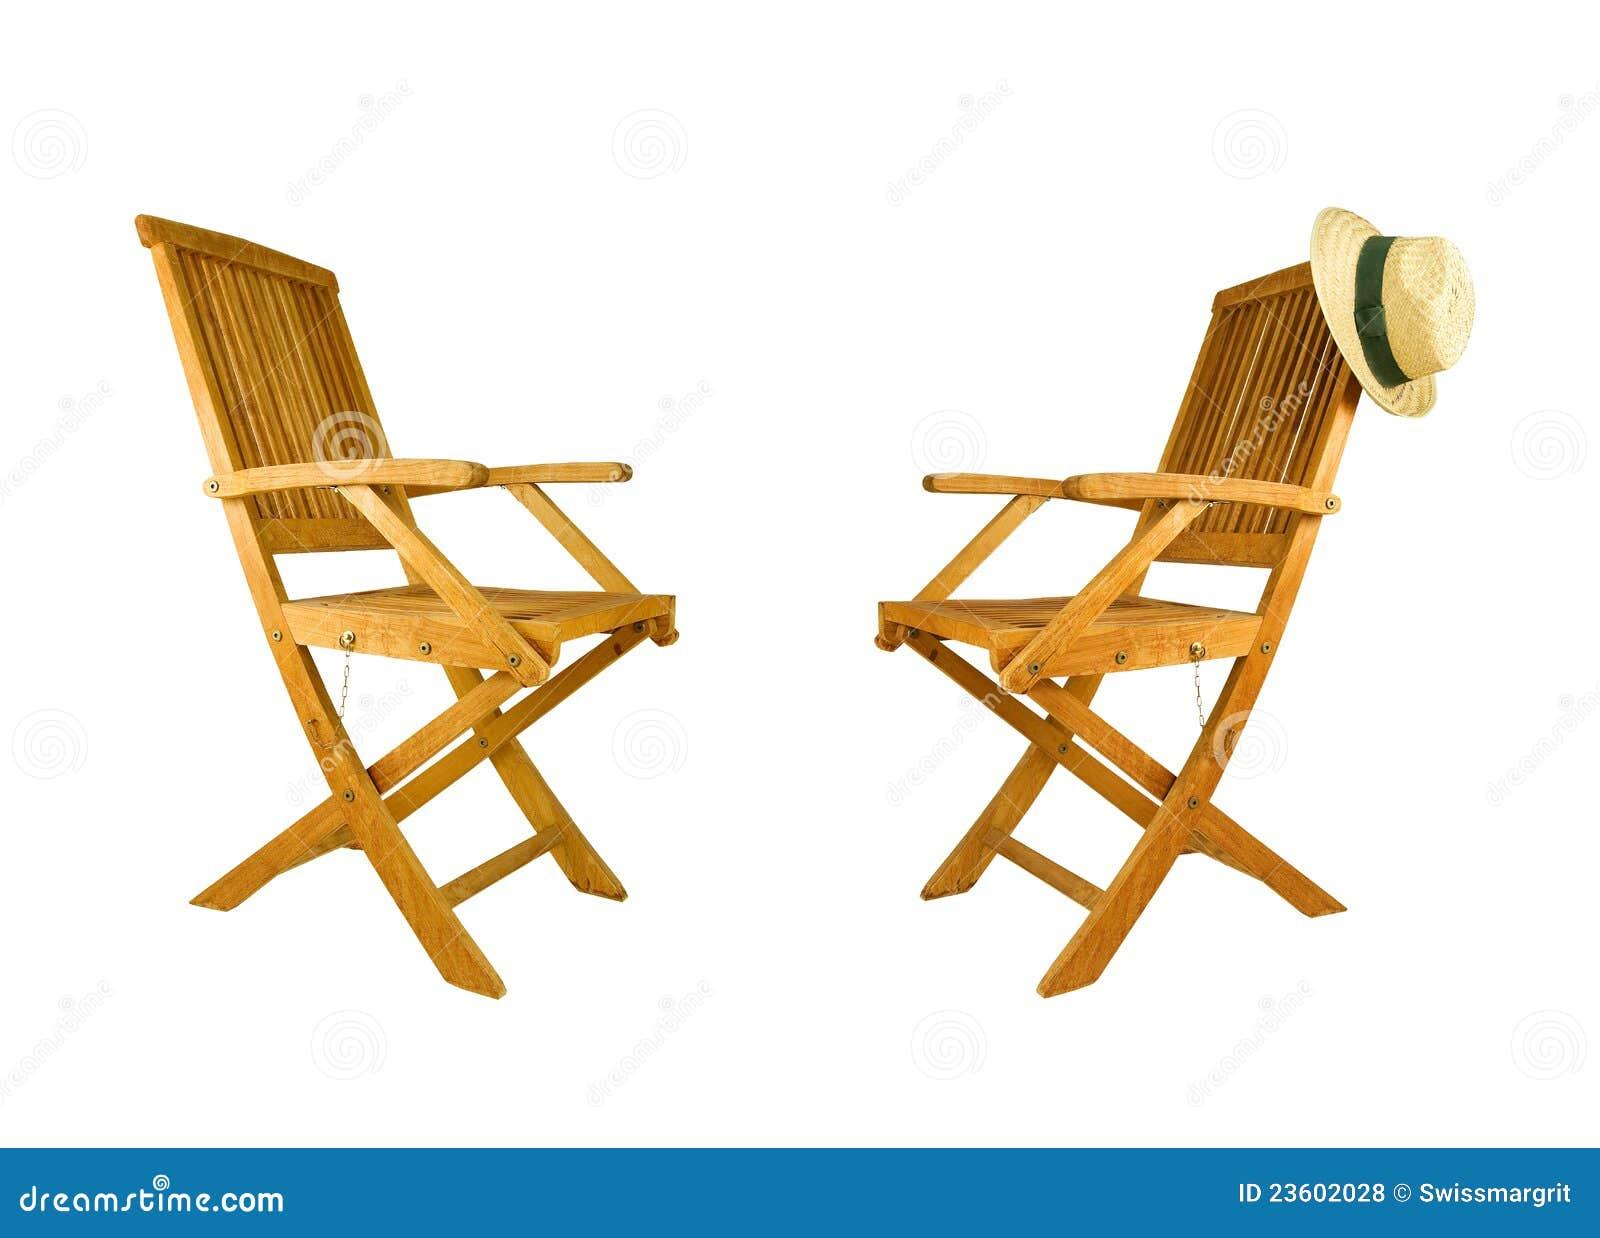 Two folding teak wood deck chair